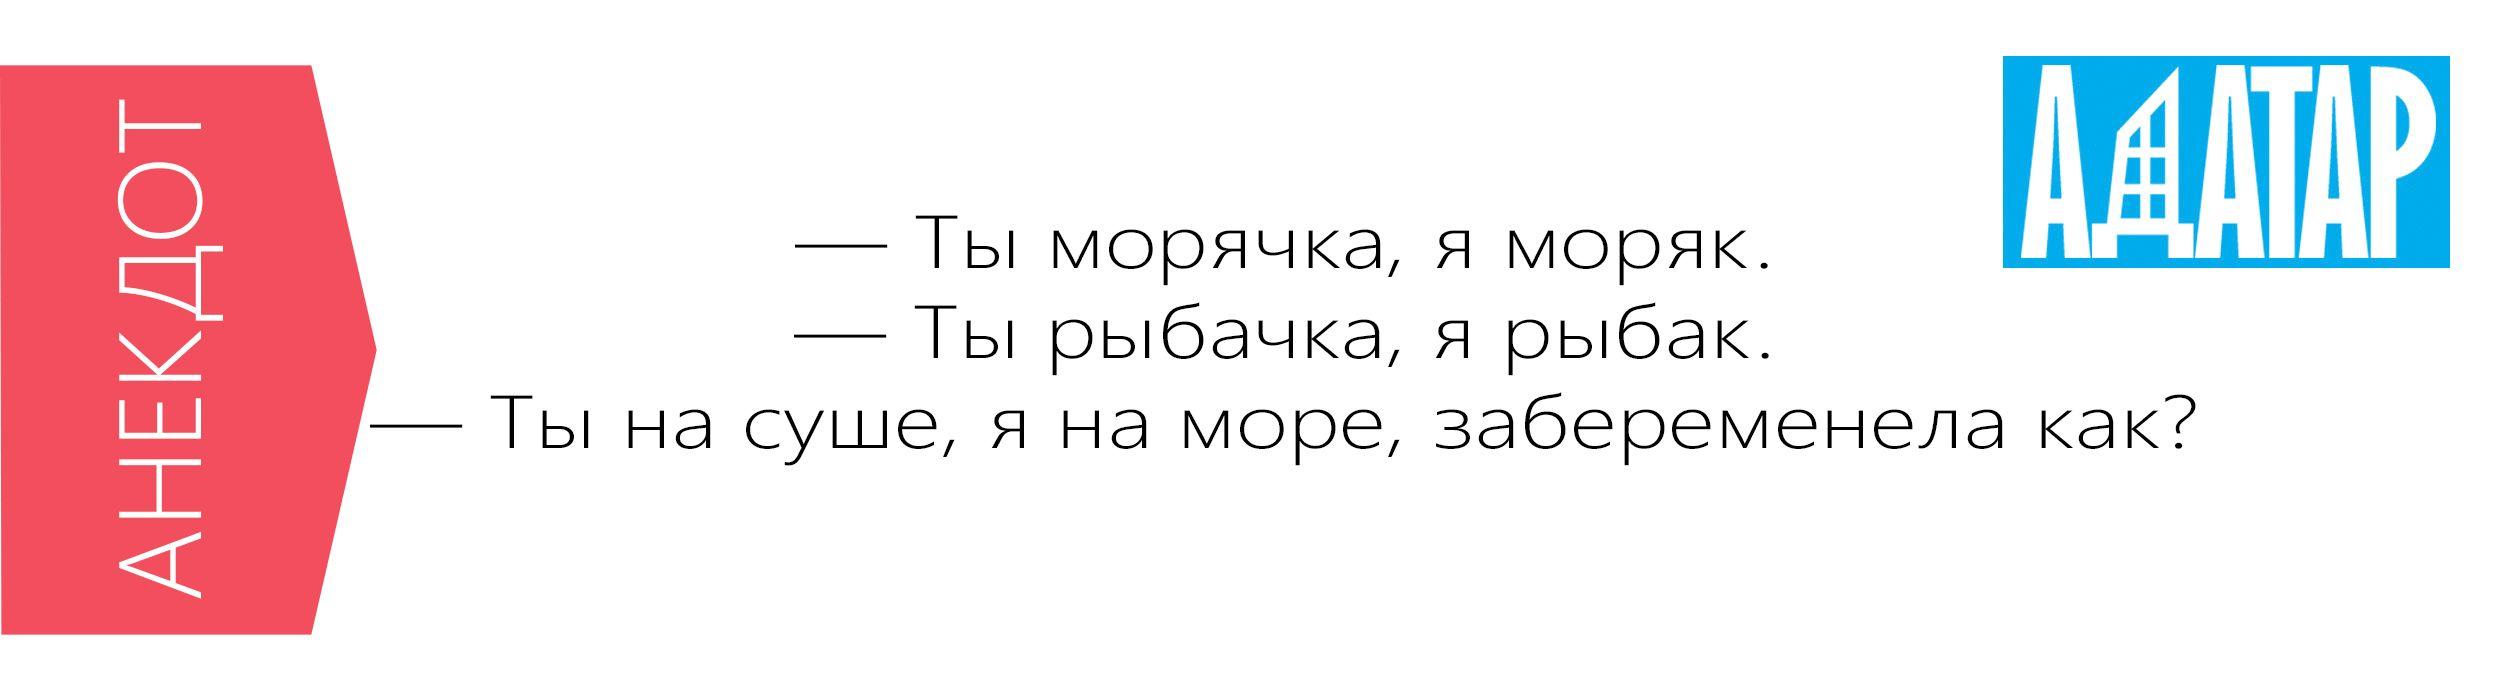 АНЕКДОТ 36.jpg